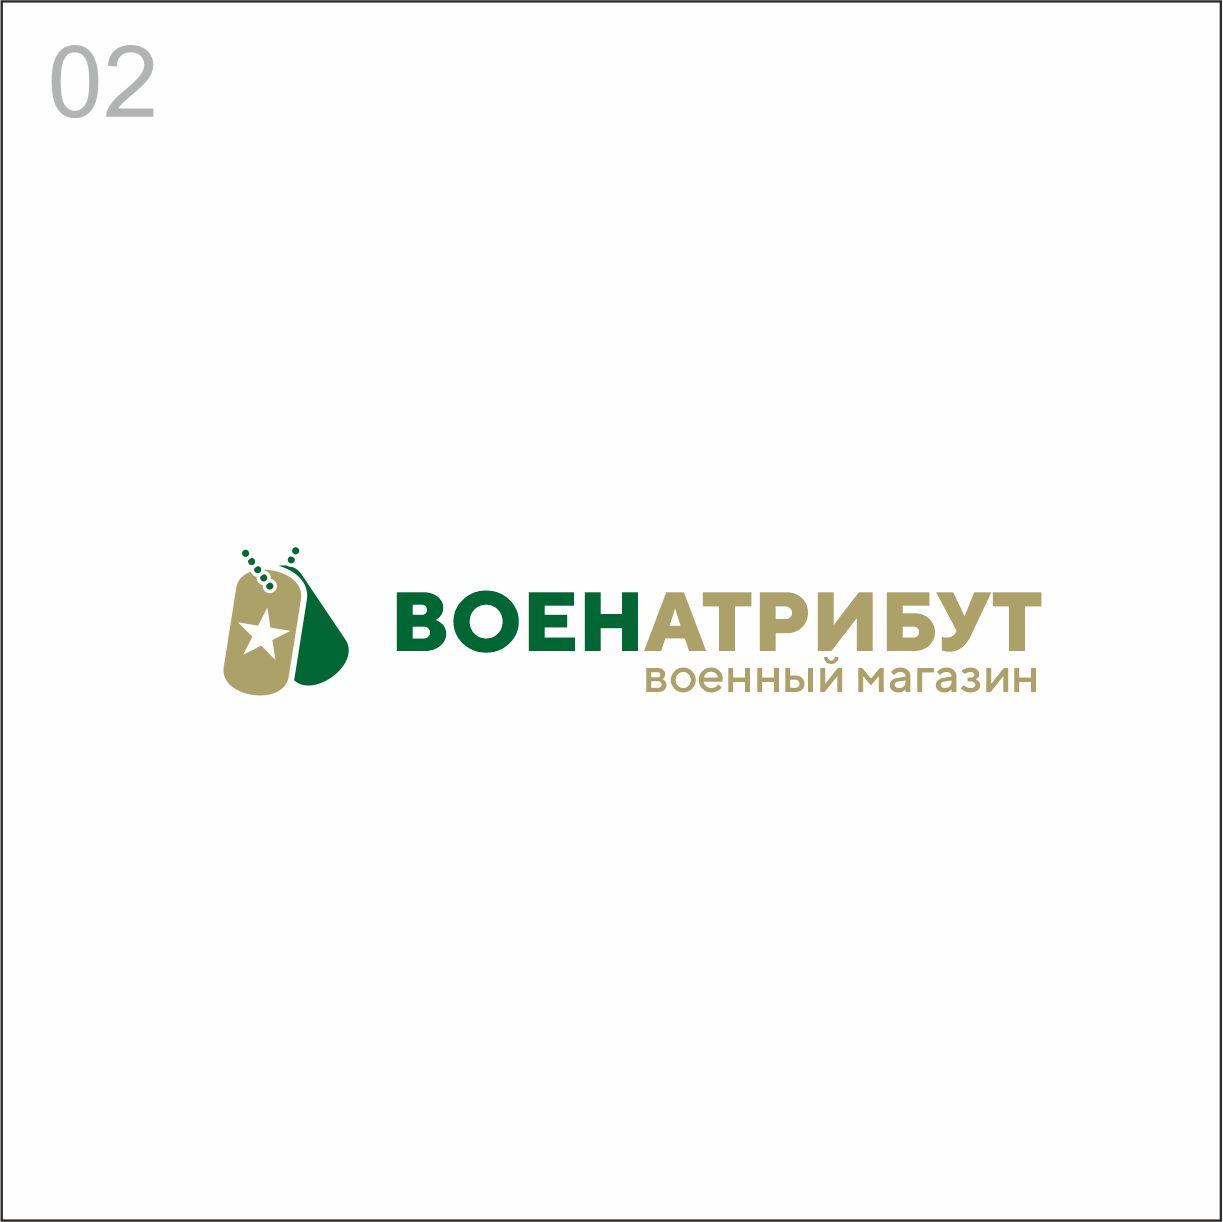 Разработка логотипа для компании военной тематики фото f_885601d143fd0566.jpg